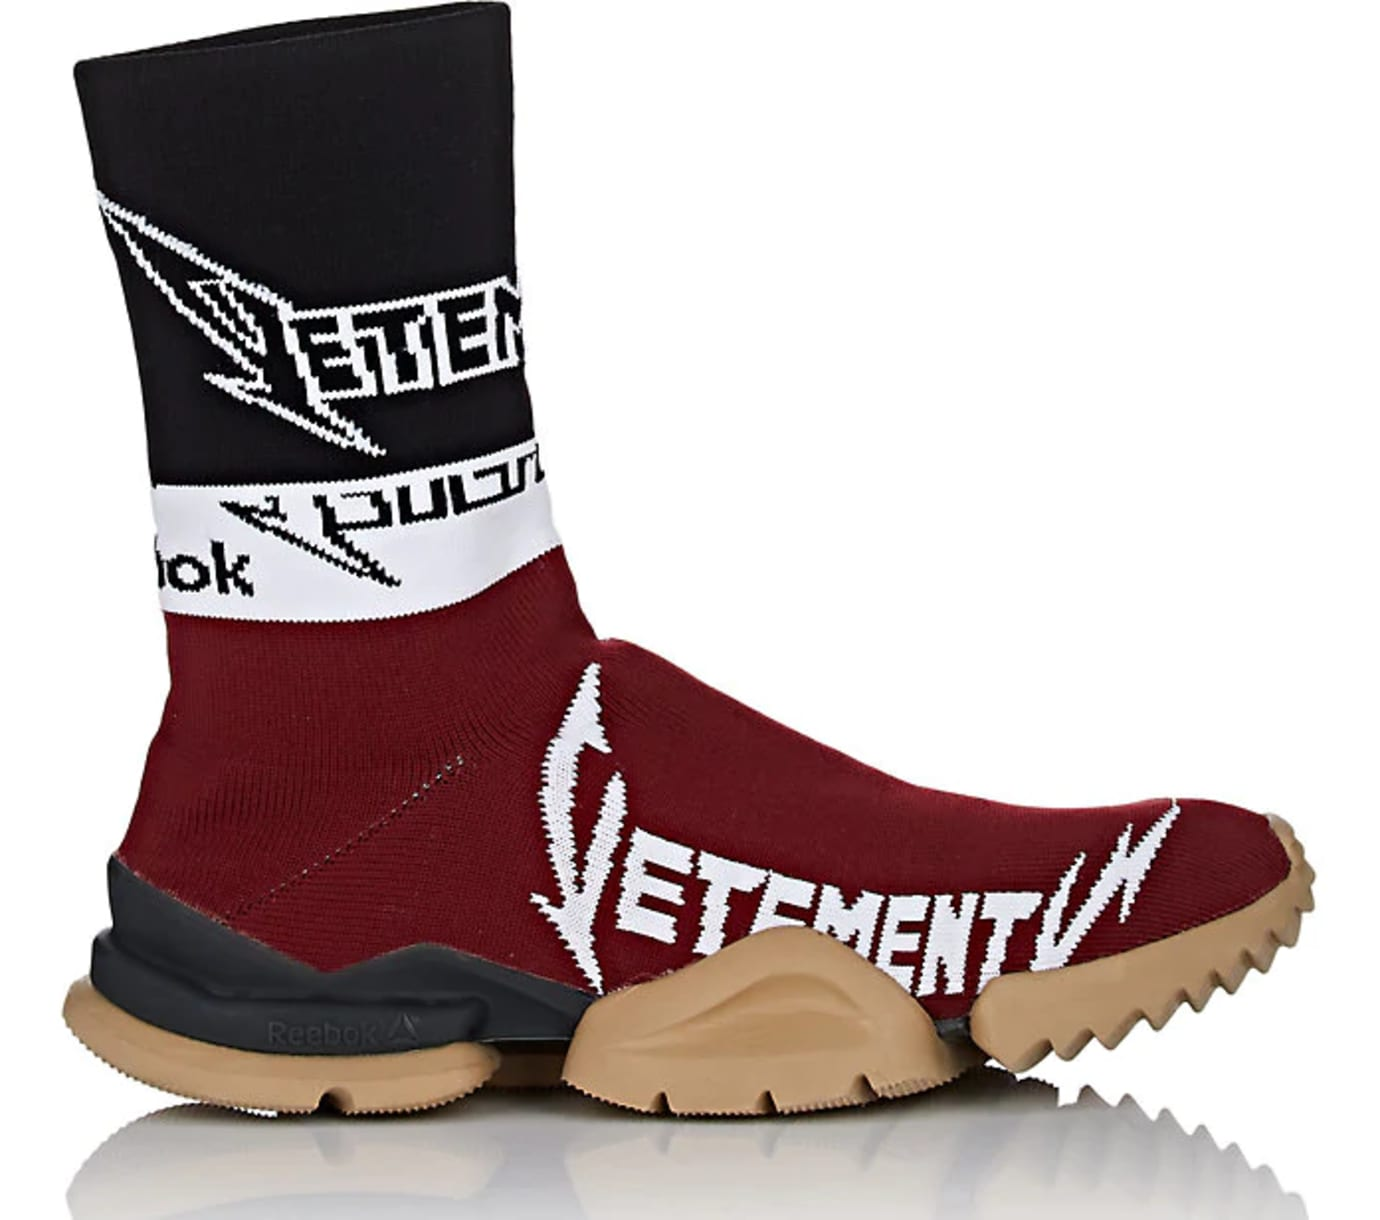 6a32f17c06563 Vetements x Reebok Sock Runner  Burgundy Black White